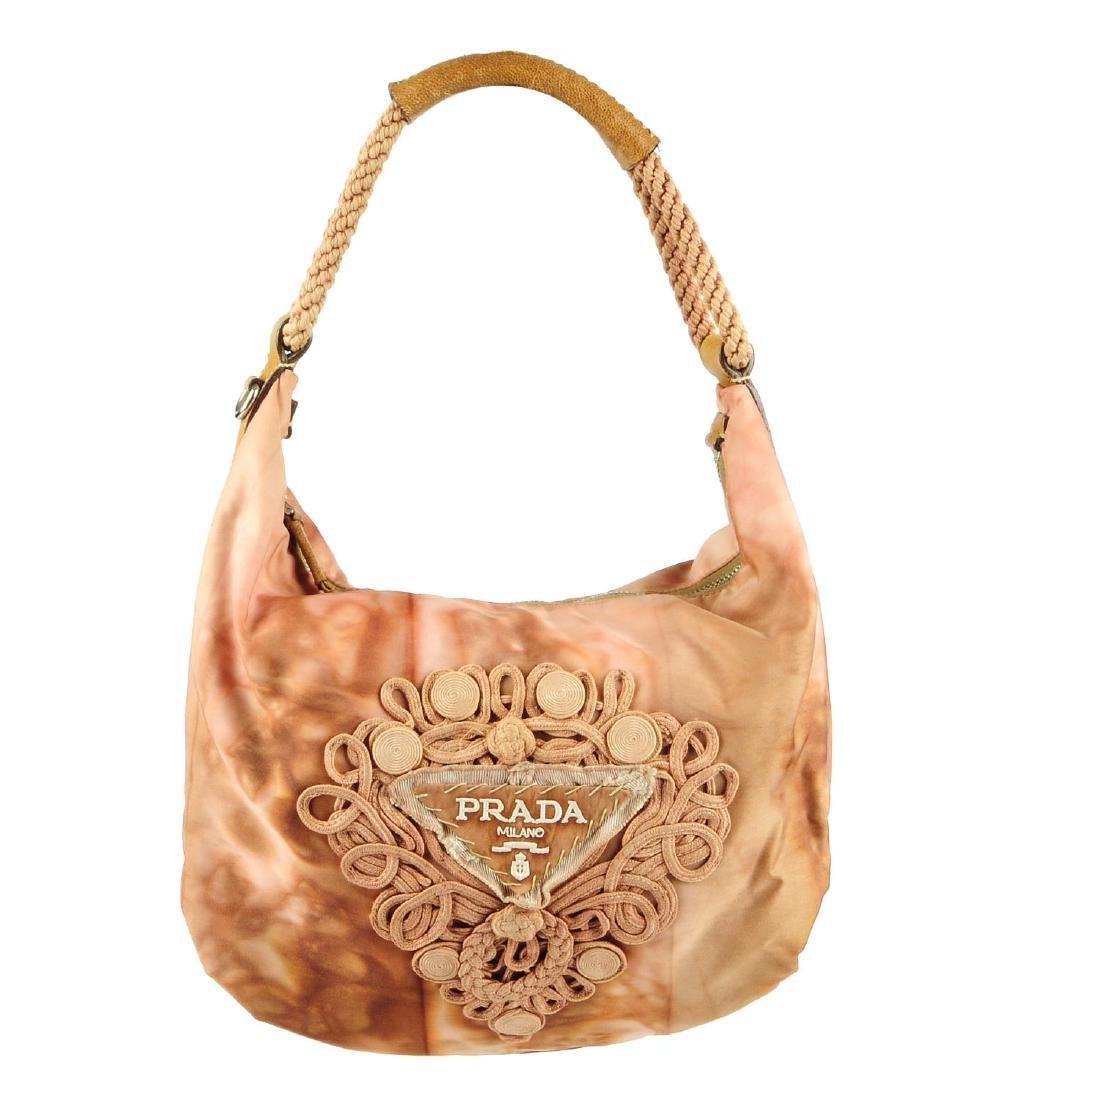 PRADA - a pink Tessuto Tie-Dye hobo handbag. Featuring